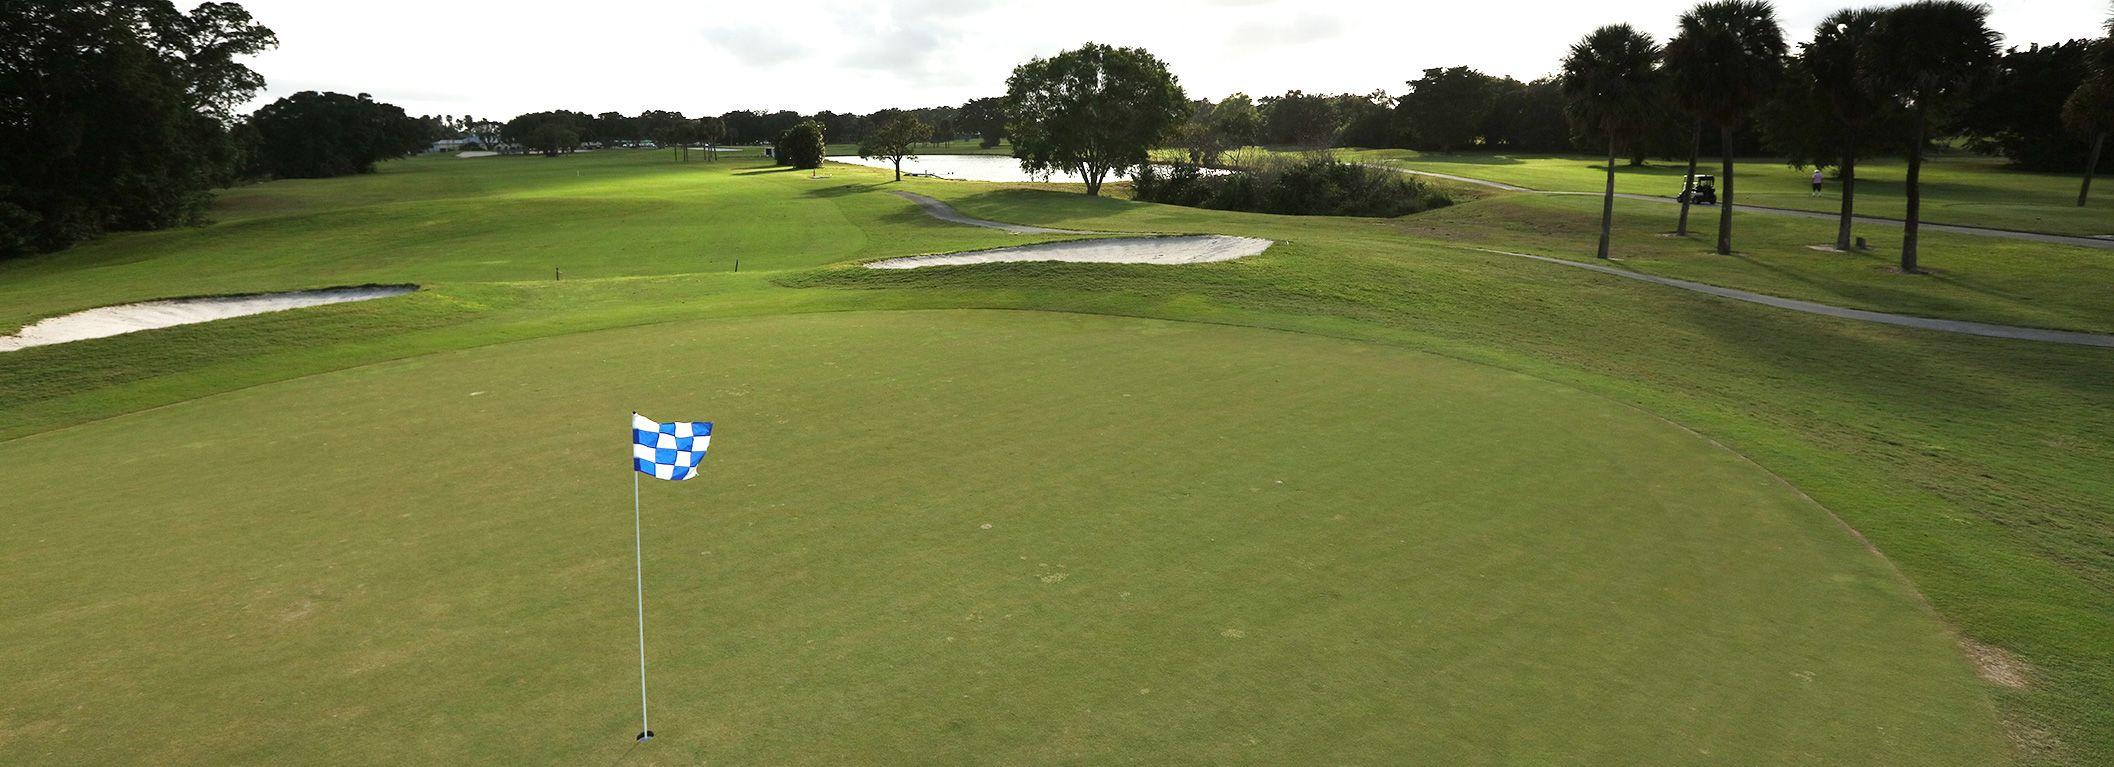 Welcome To Delray Beach Golf Club Delray Beach Golf Club